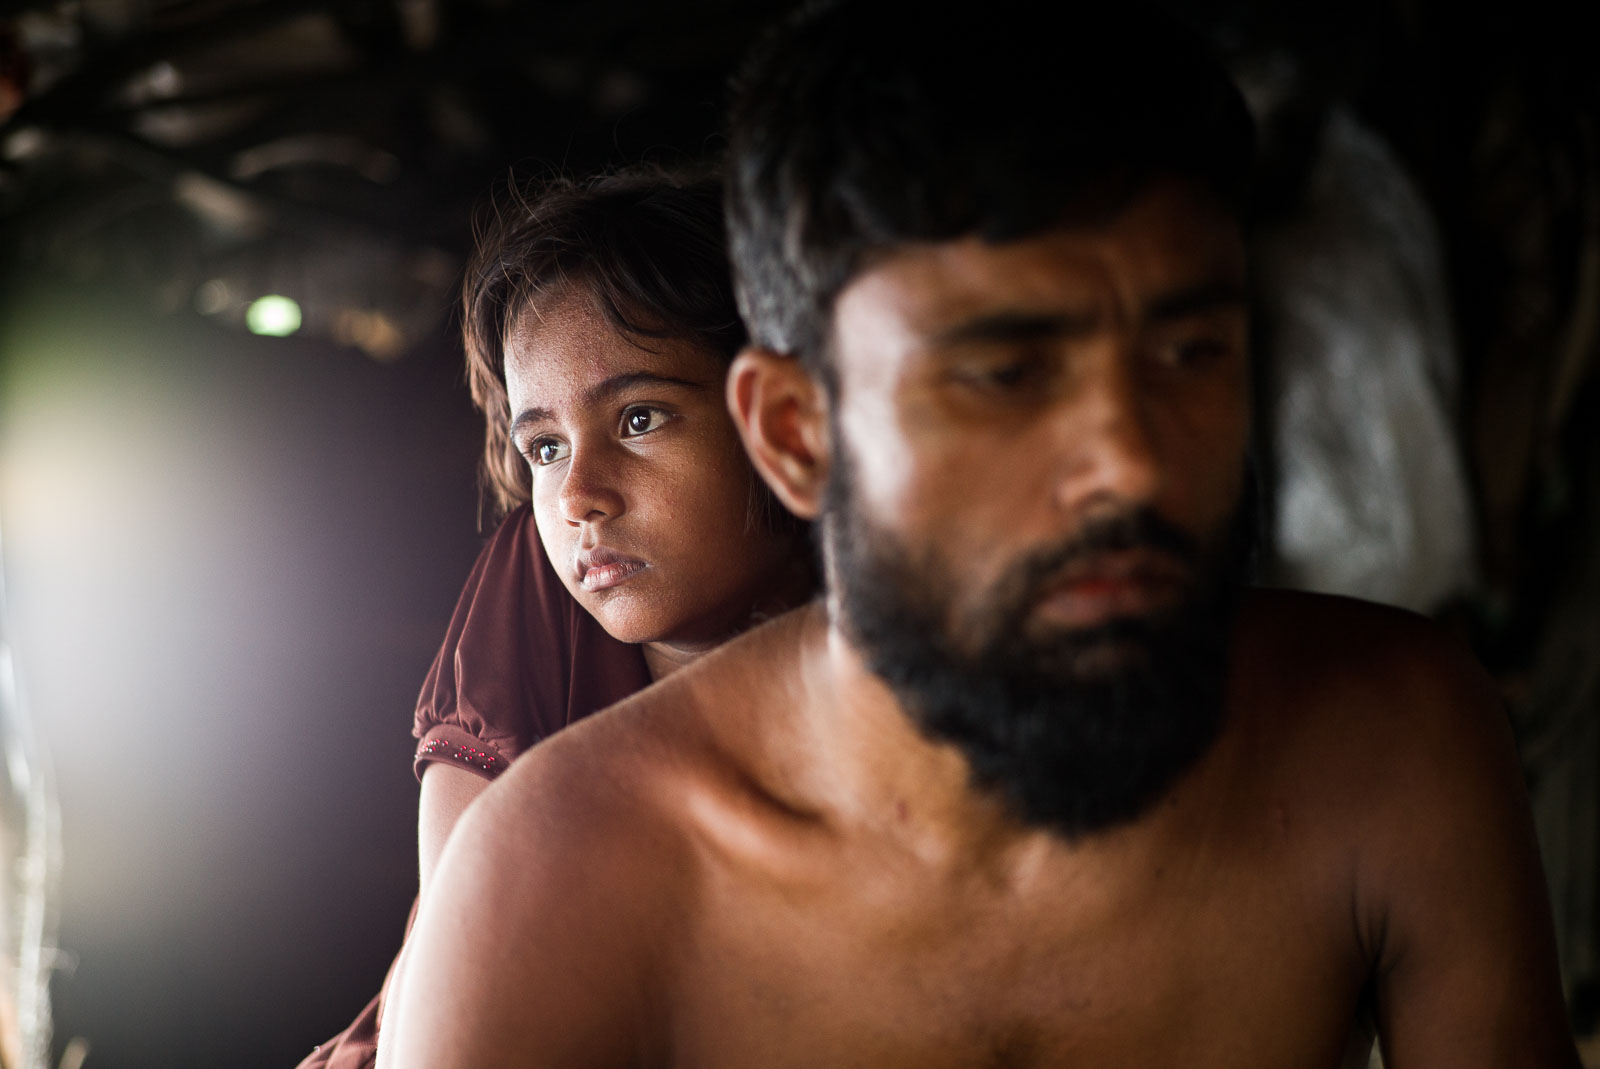 florian_lang_rohingya_refugees_bangladesh-7